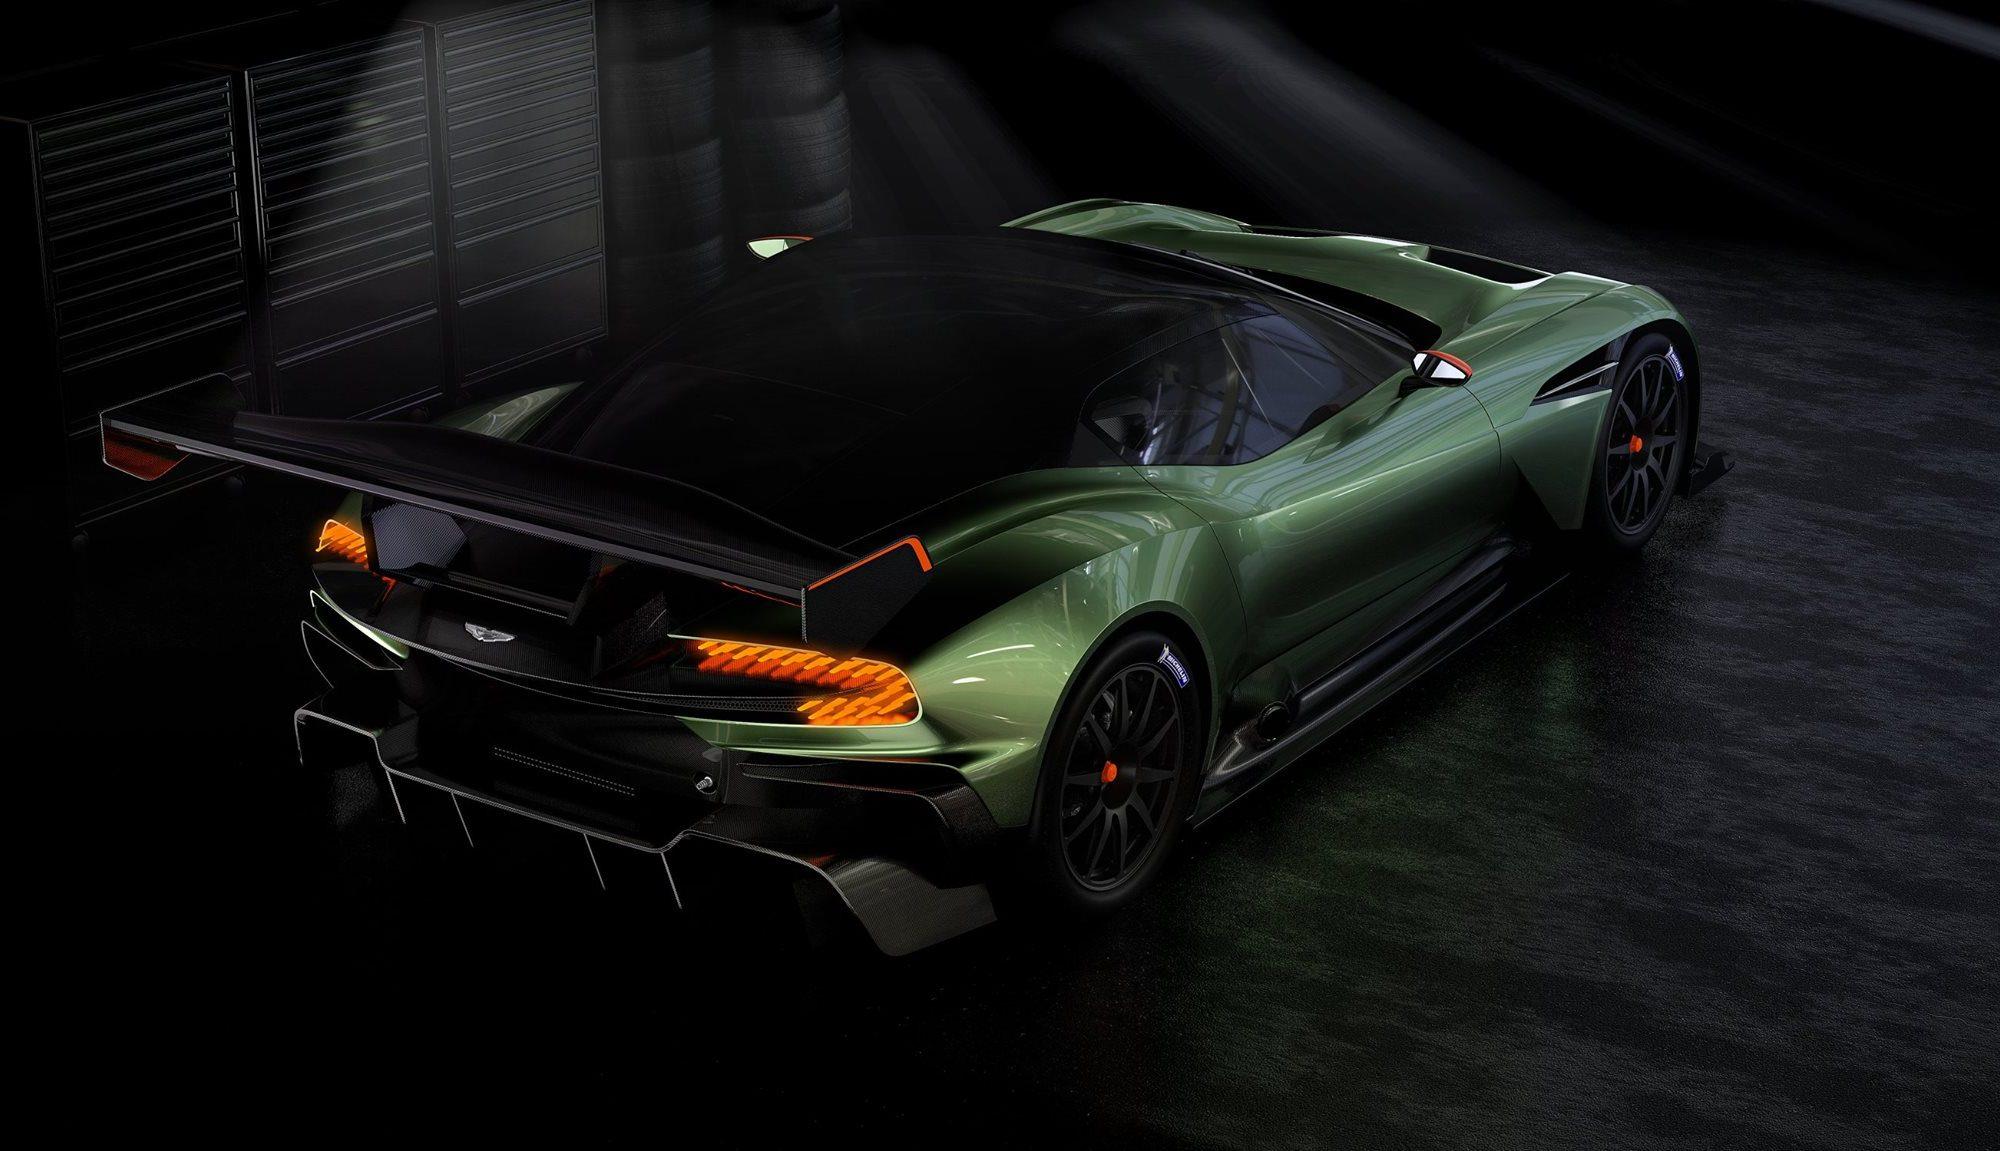 Aston Martin Vulcan aus verschiedenen Perspektiven